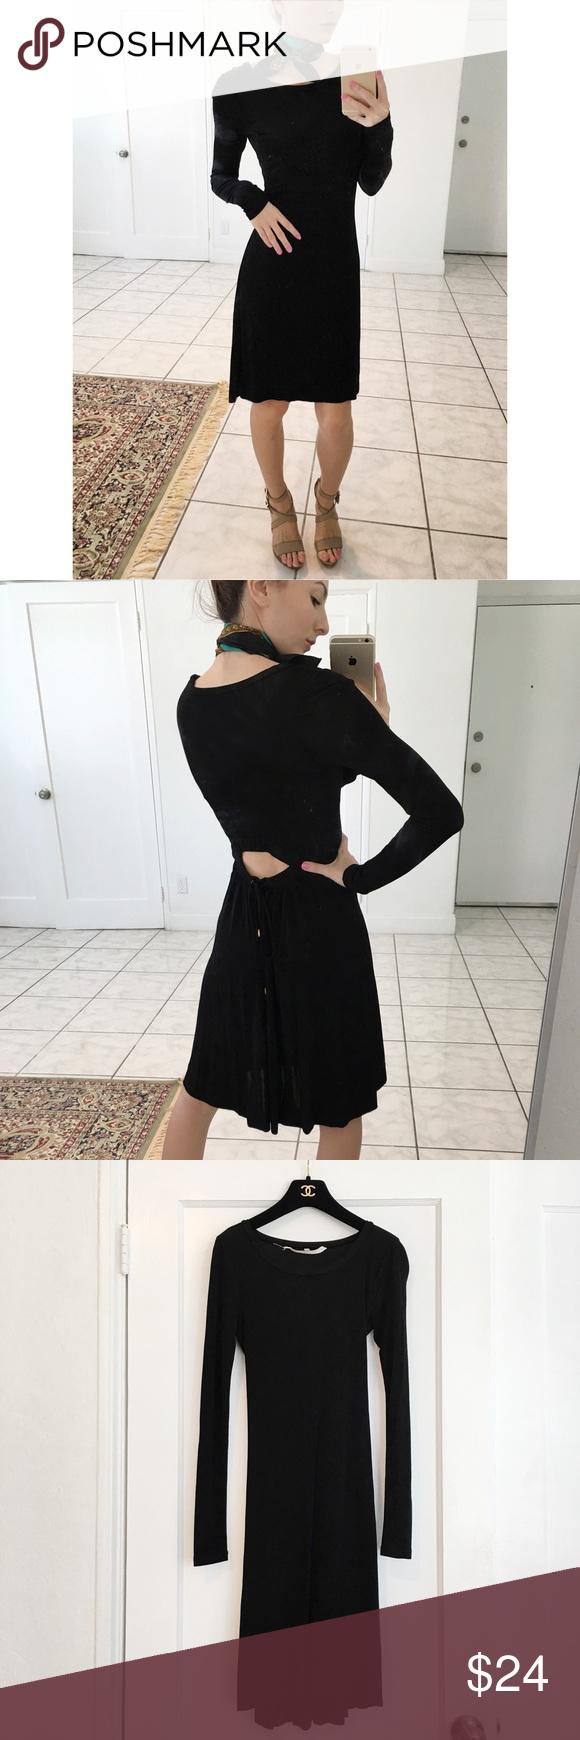 Chic long sleeve cut out dress rachel roy dresses rachel roy and lbd